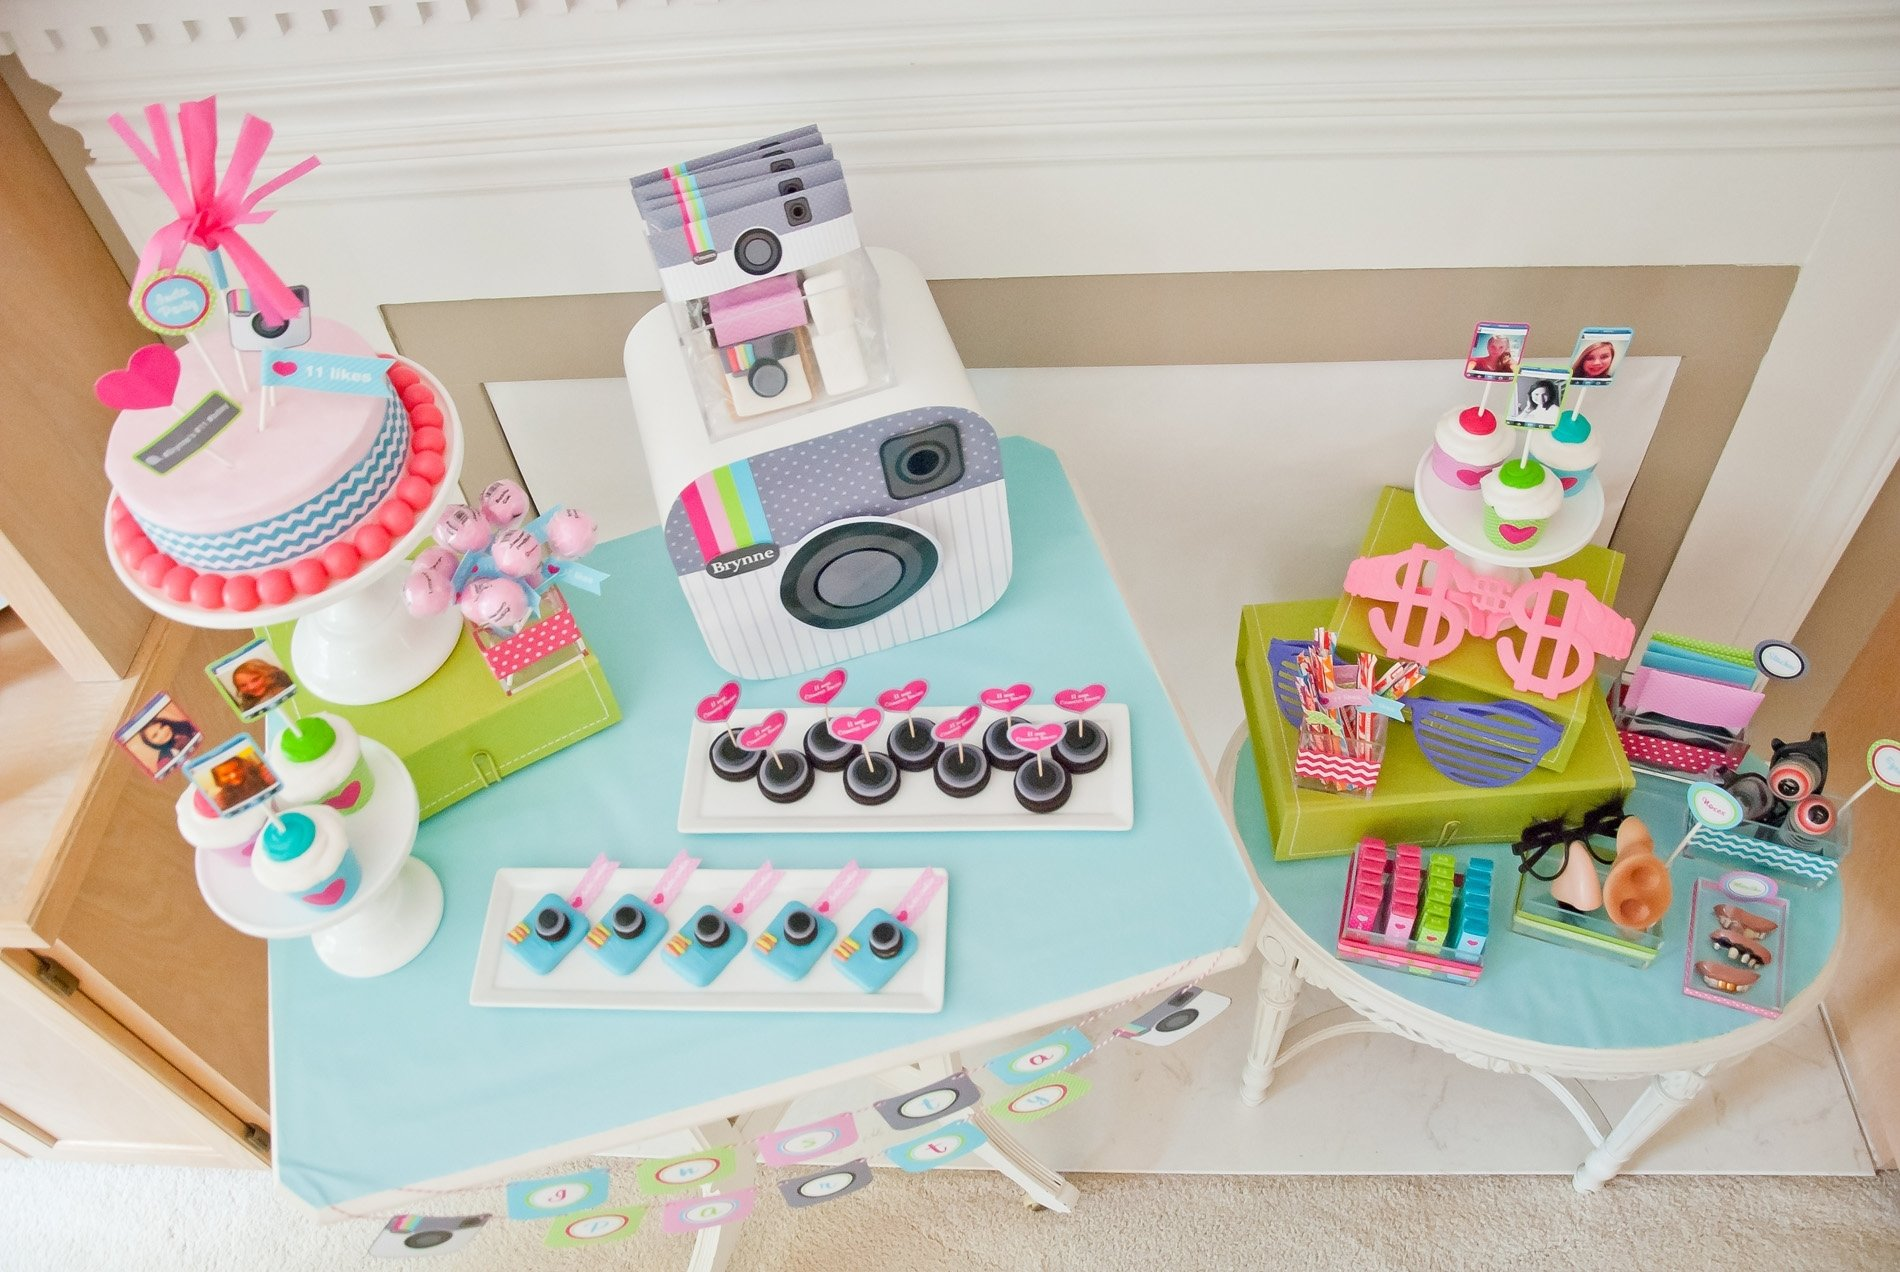 10 Fabulous Cool Teenage Birthday Party Ideas tween teen insta party instragram birthday party anders ruff 1 2021